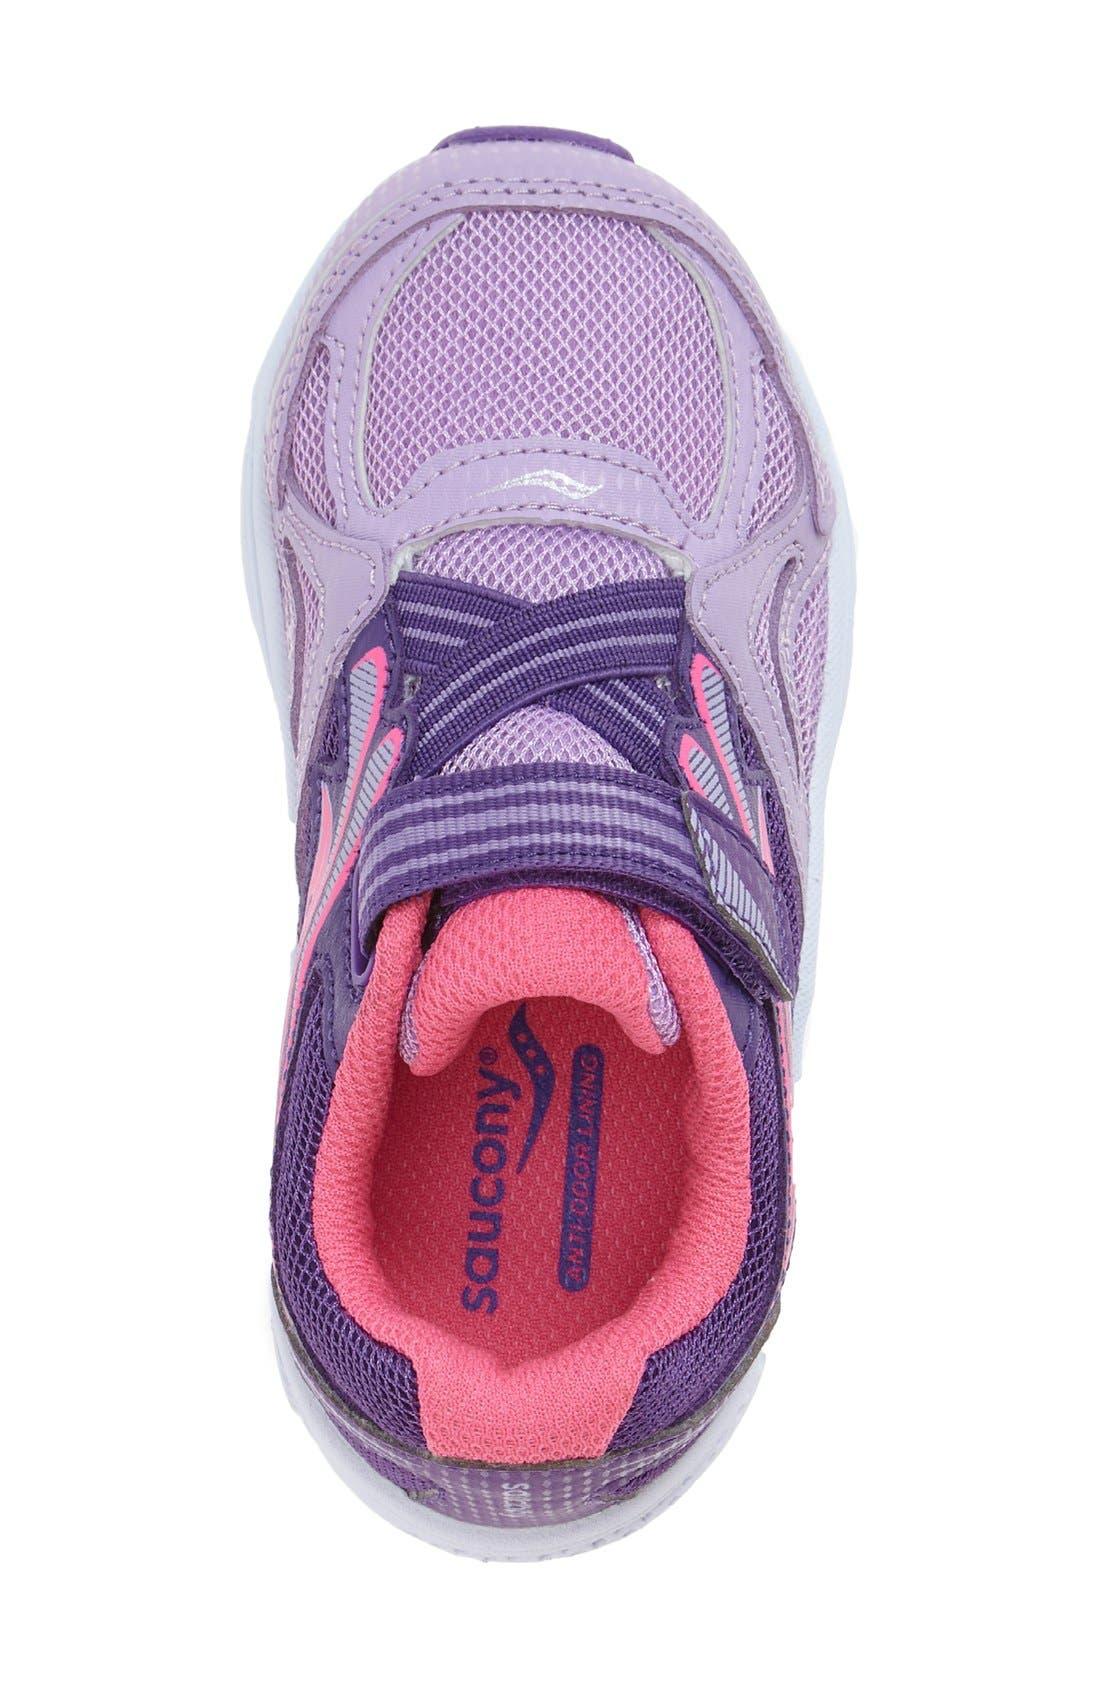 Baby Ride Sneaker,                             Alternate thumbnail 3, color,                             Purple